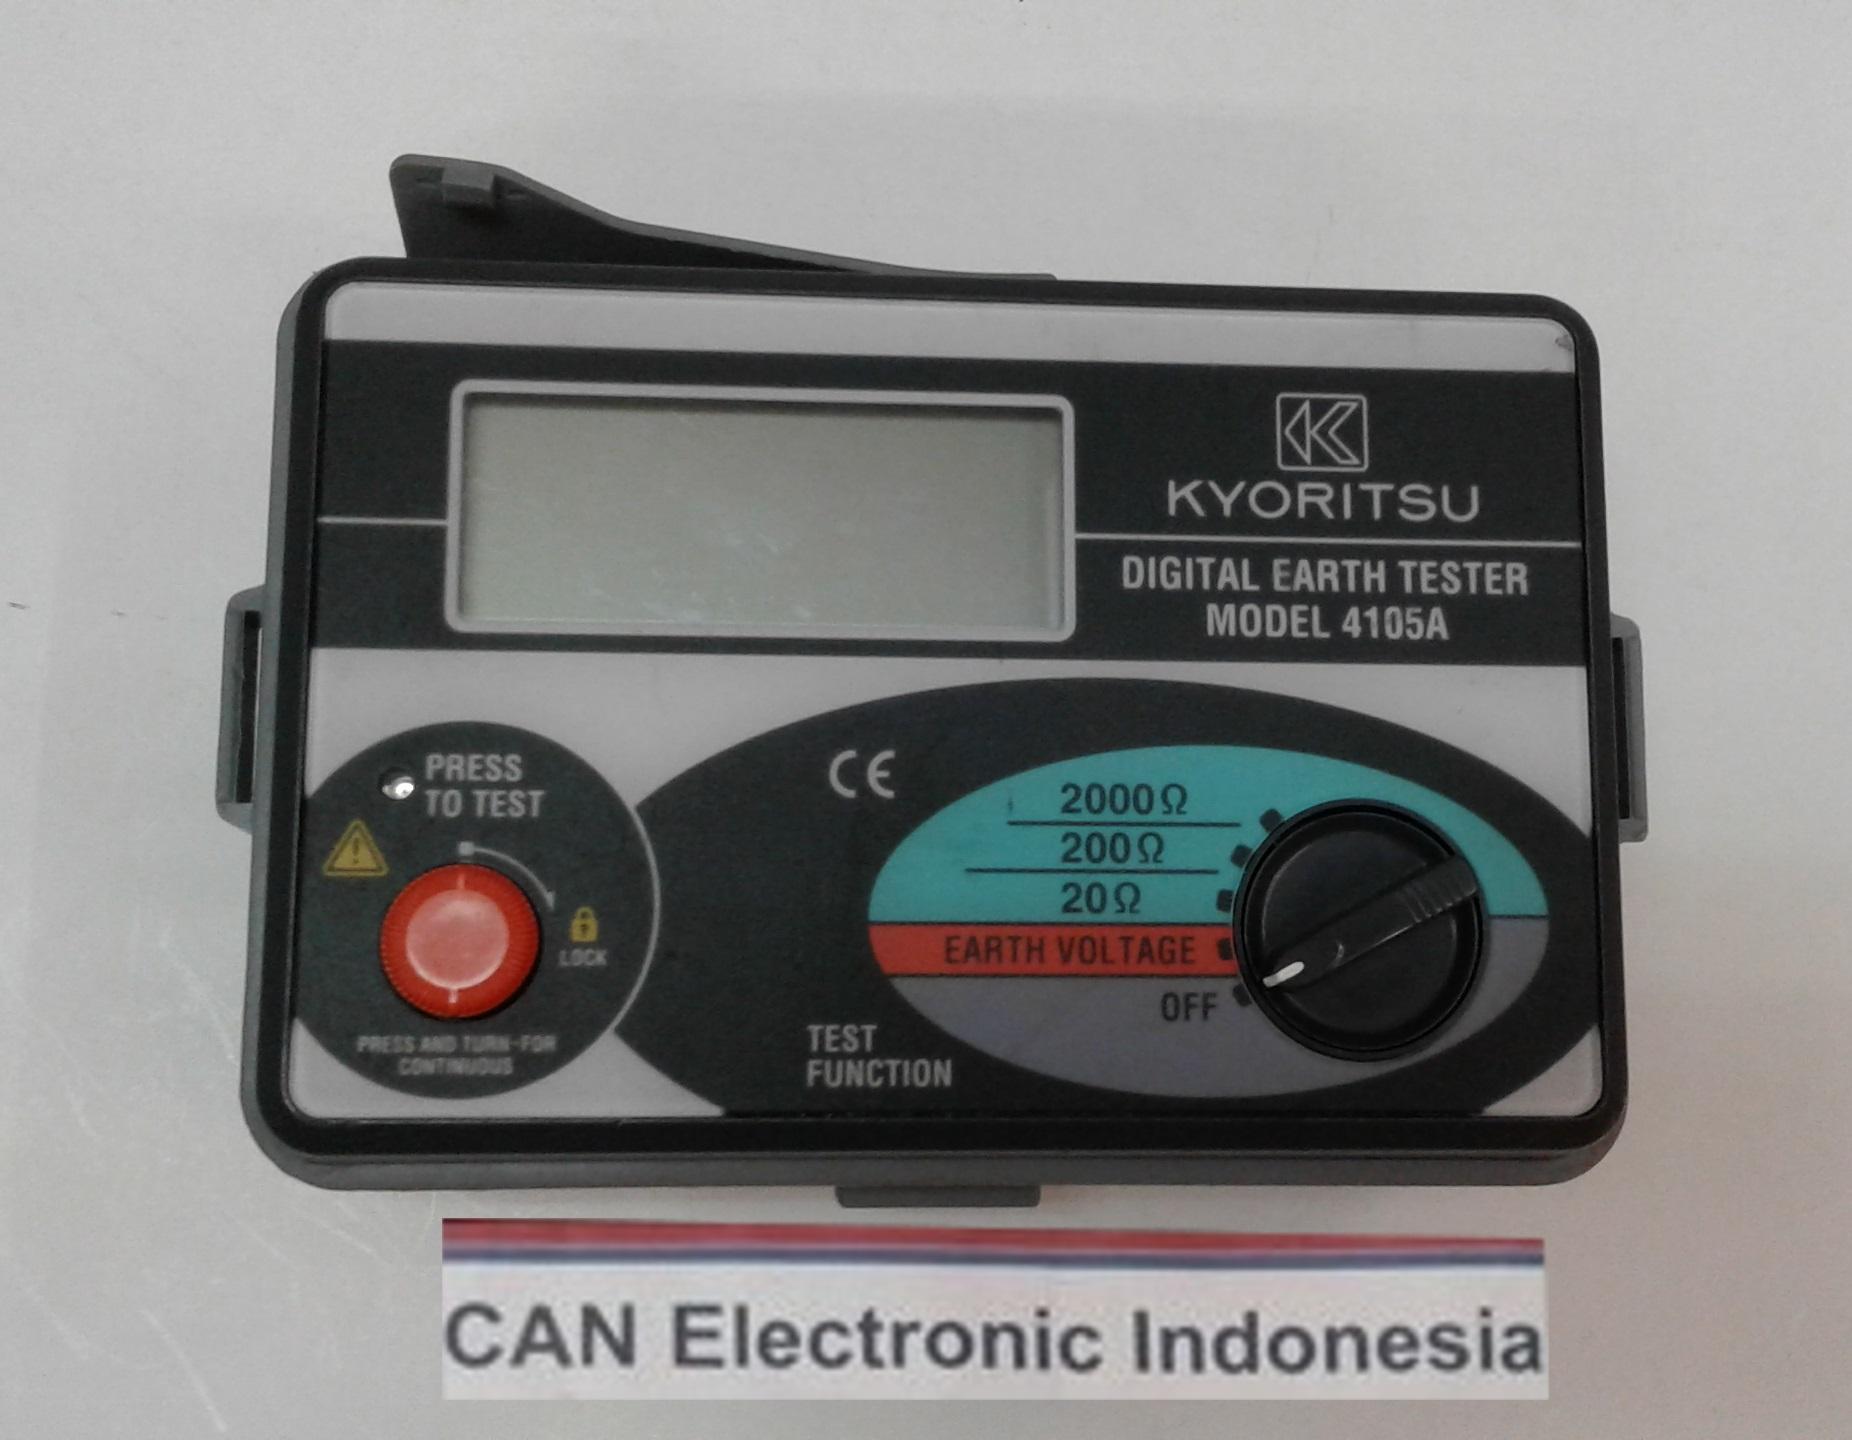 Harga Dan Spesifikasi Digital Earth Tester Terbaru 2018 Kyoritsu 4300 Jual 4105a Can Electronic Tokopedia